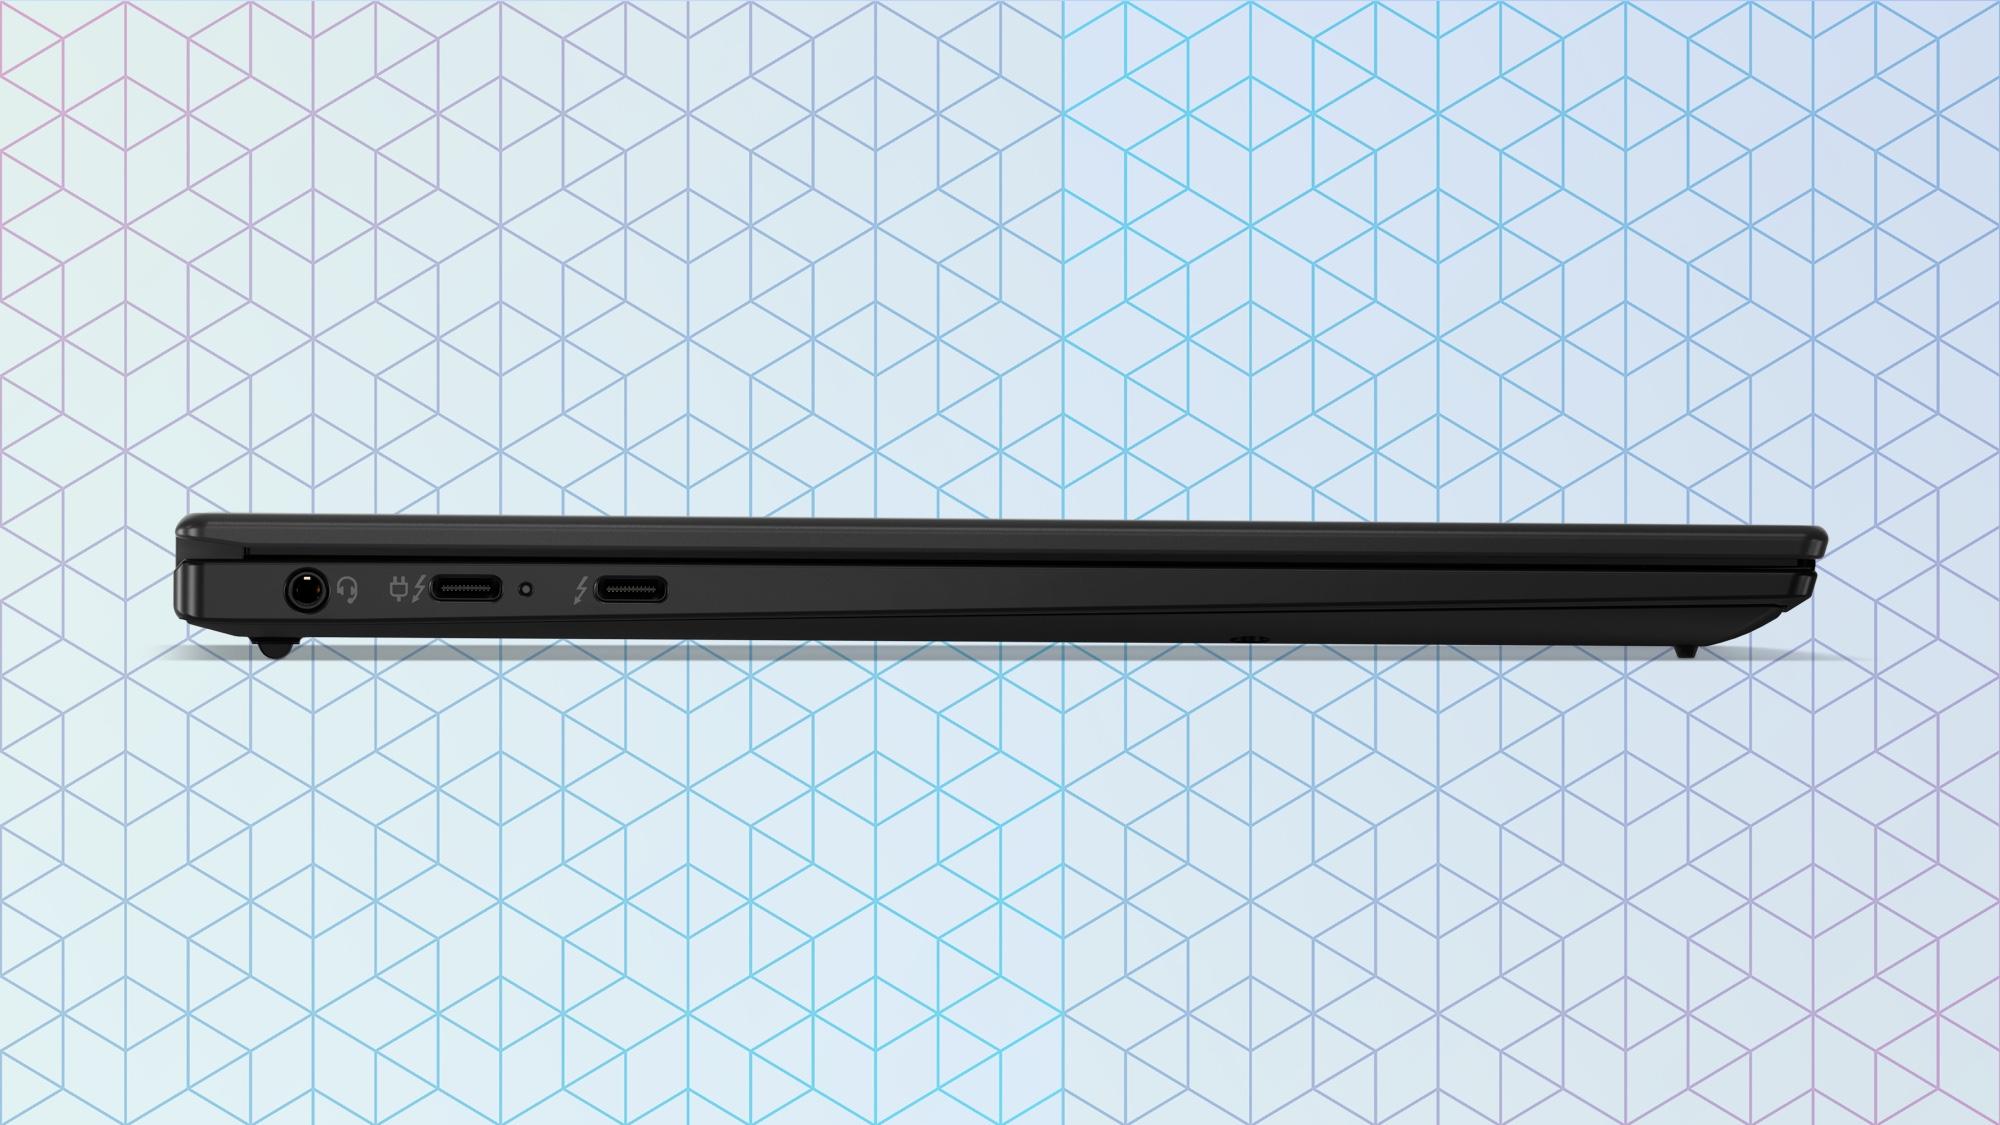 Lenovo ThinkPad X1 Nano ports